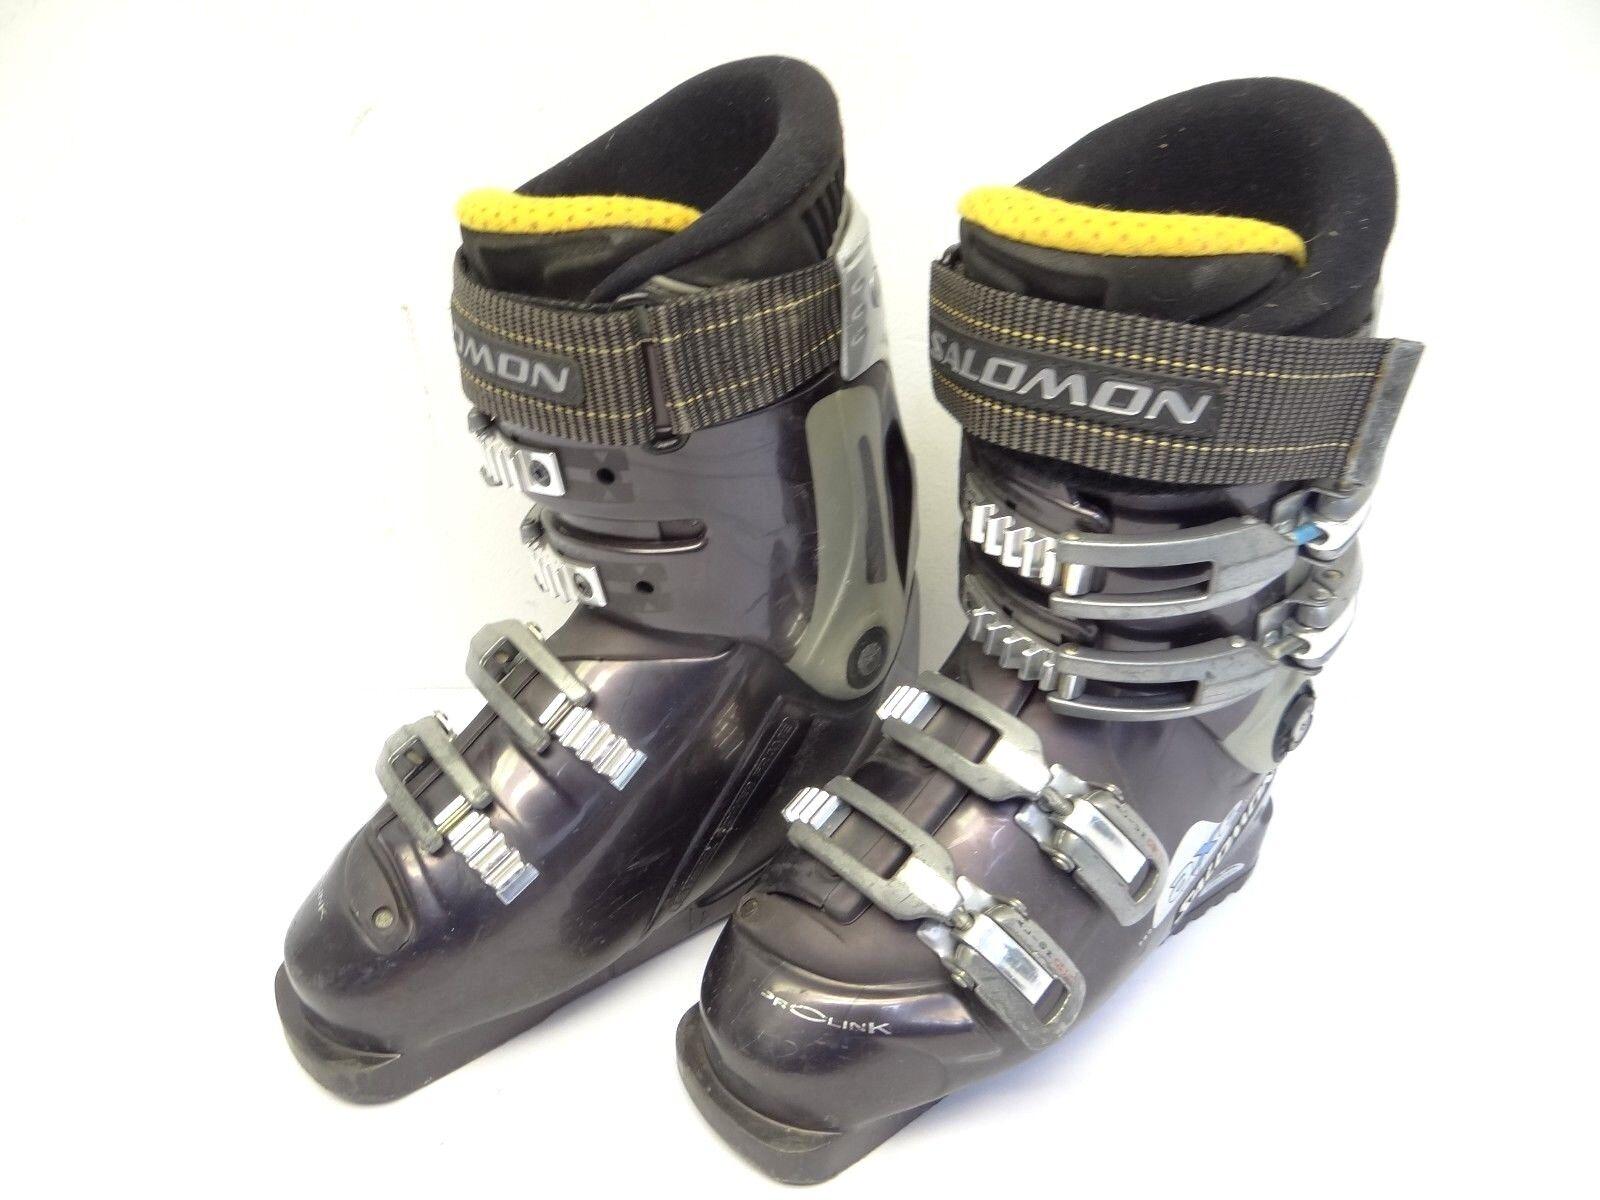 Used Salomon ProLink AXE Technology Damenschuhe US Größe 6 Ski Stiefel Custom Fit Insole